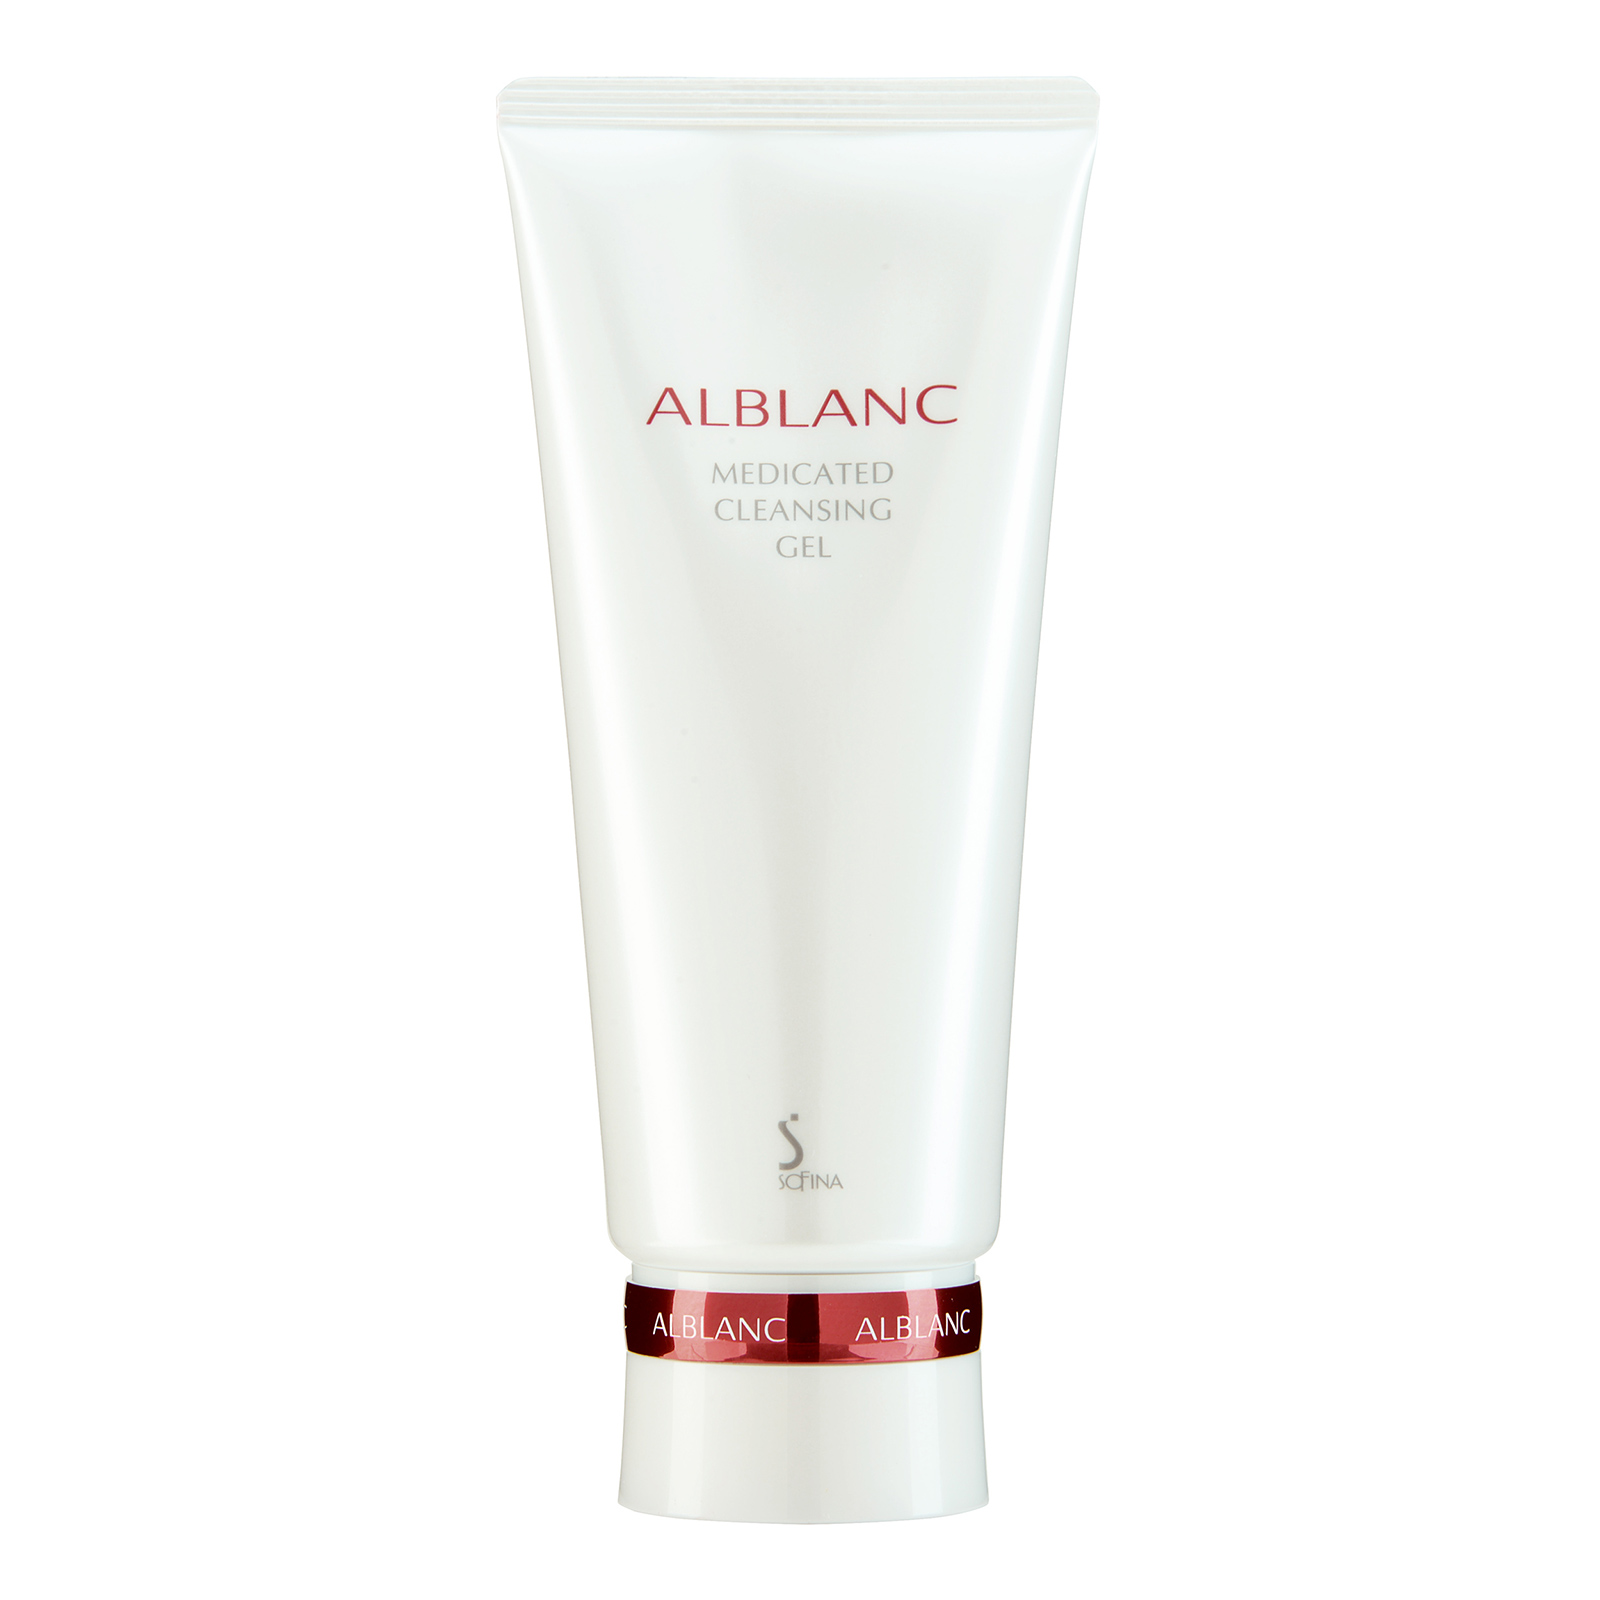 SOFINA Alblanc  Medicated Cleansing Gel 150g,